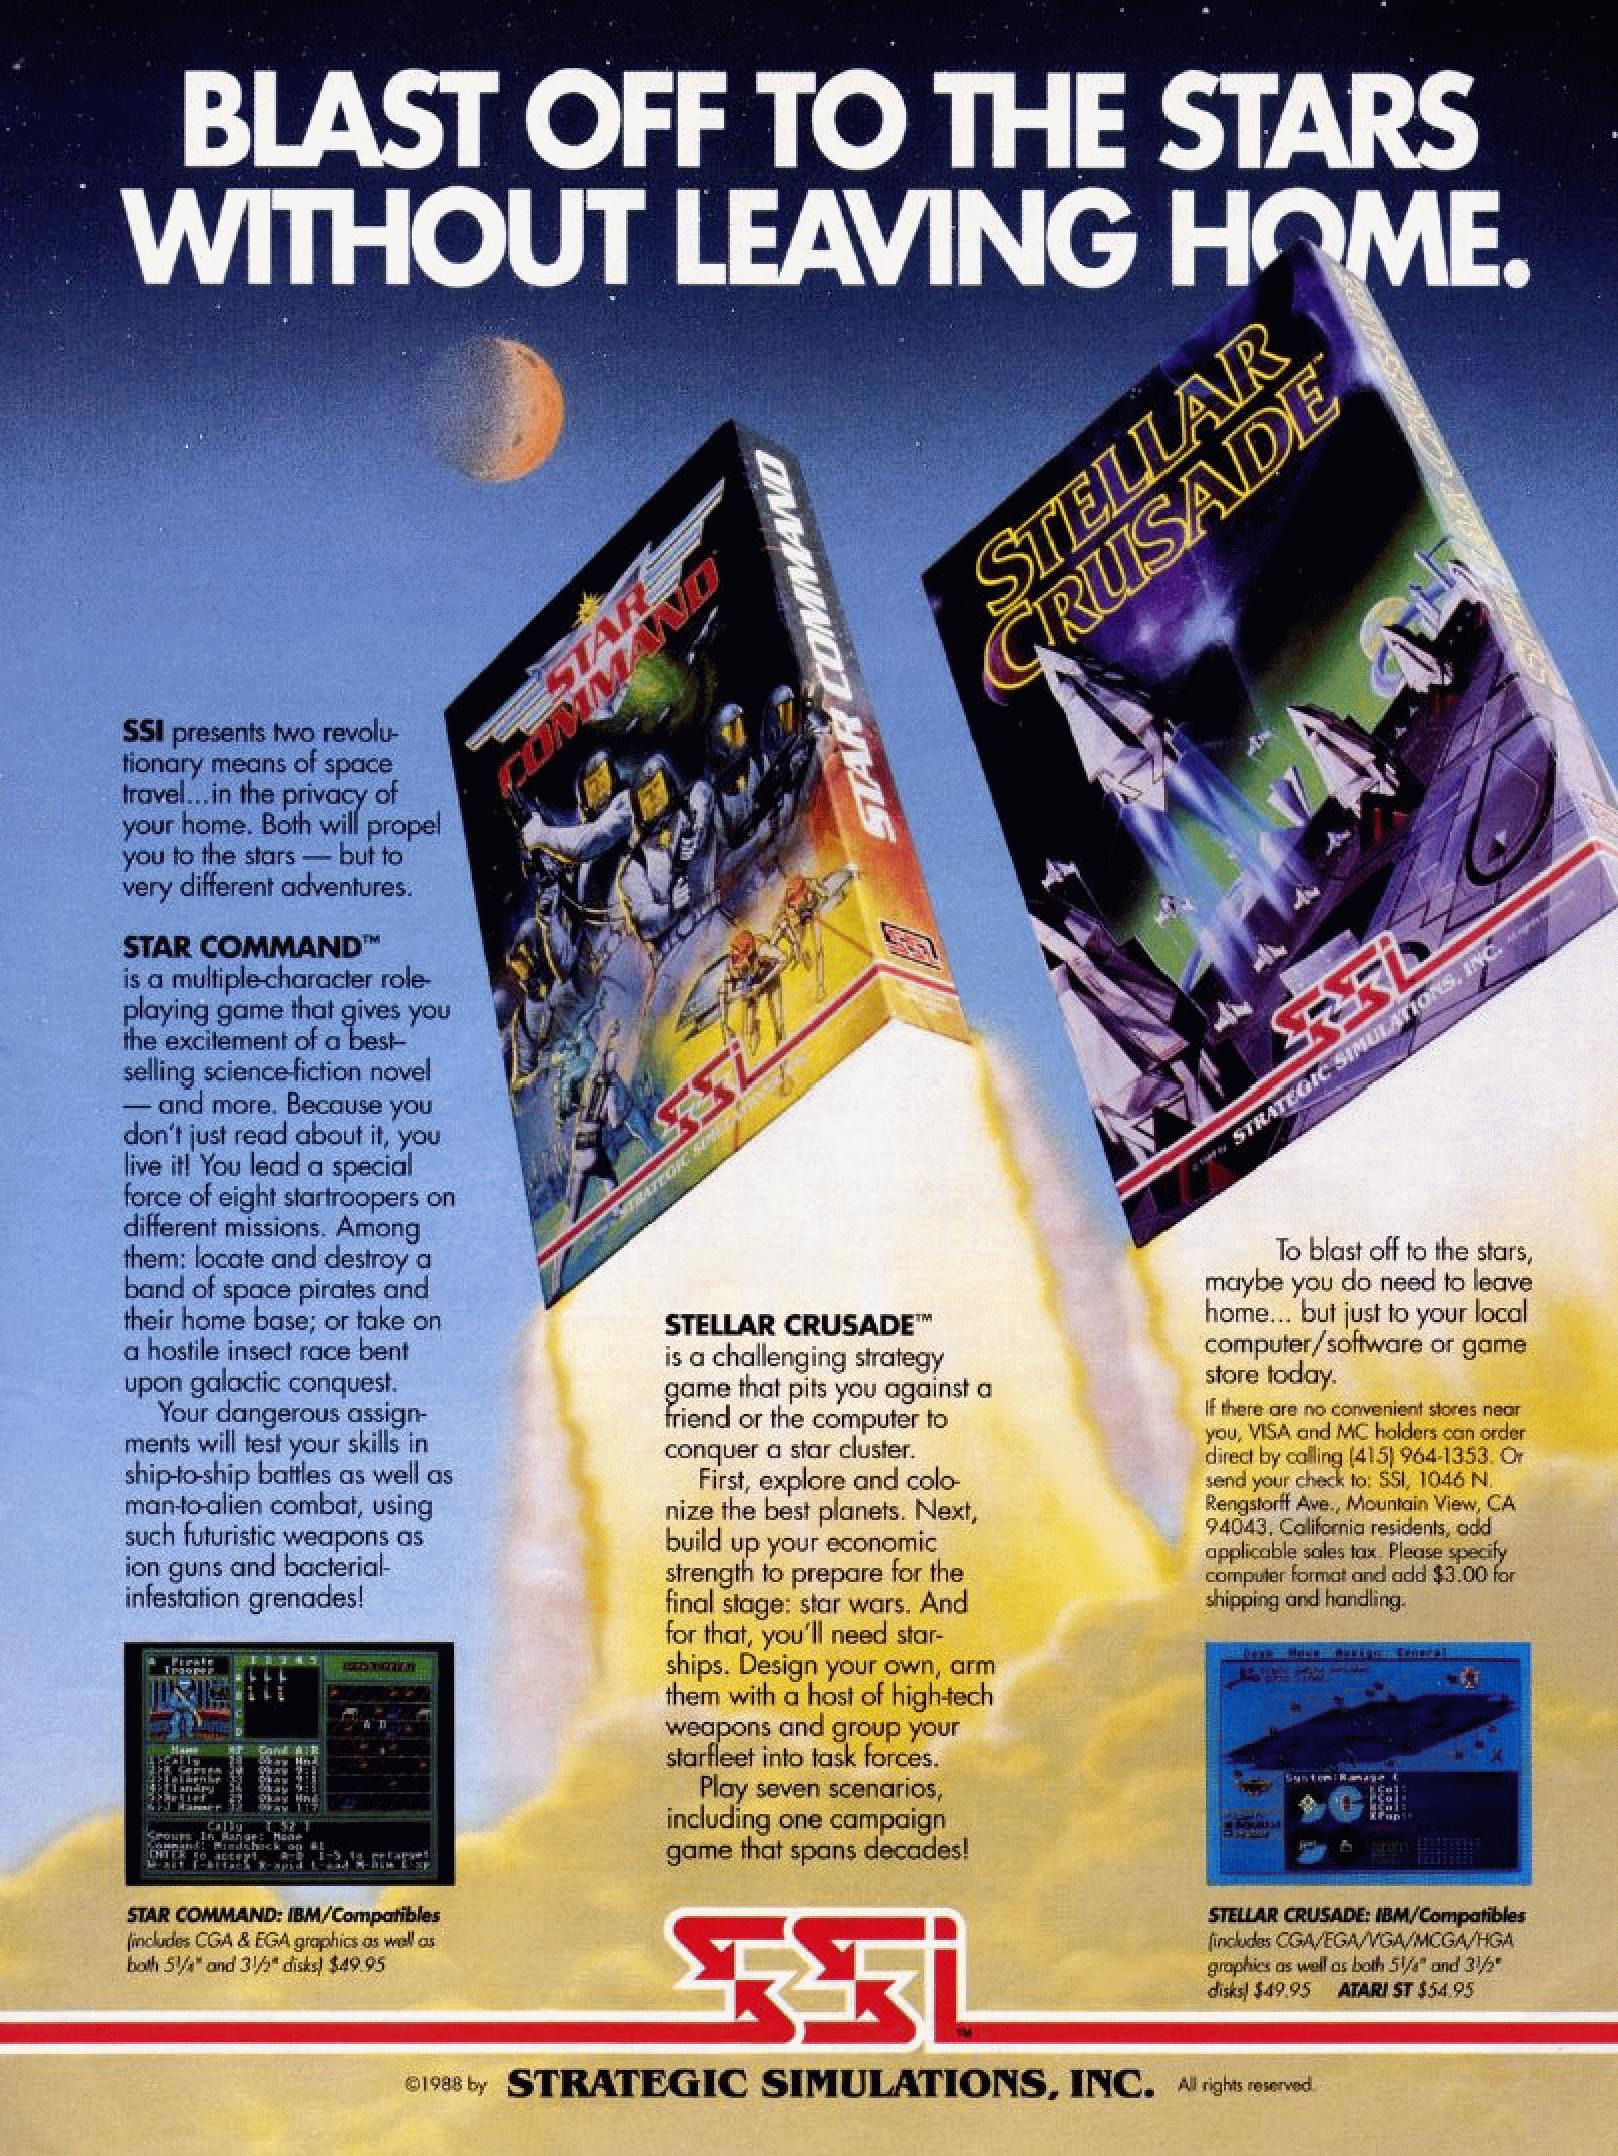 Christian Klein on Retro video games, Classic video